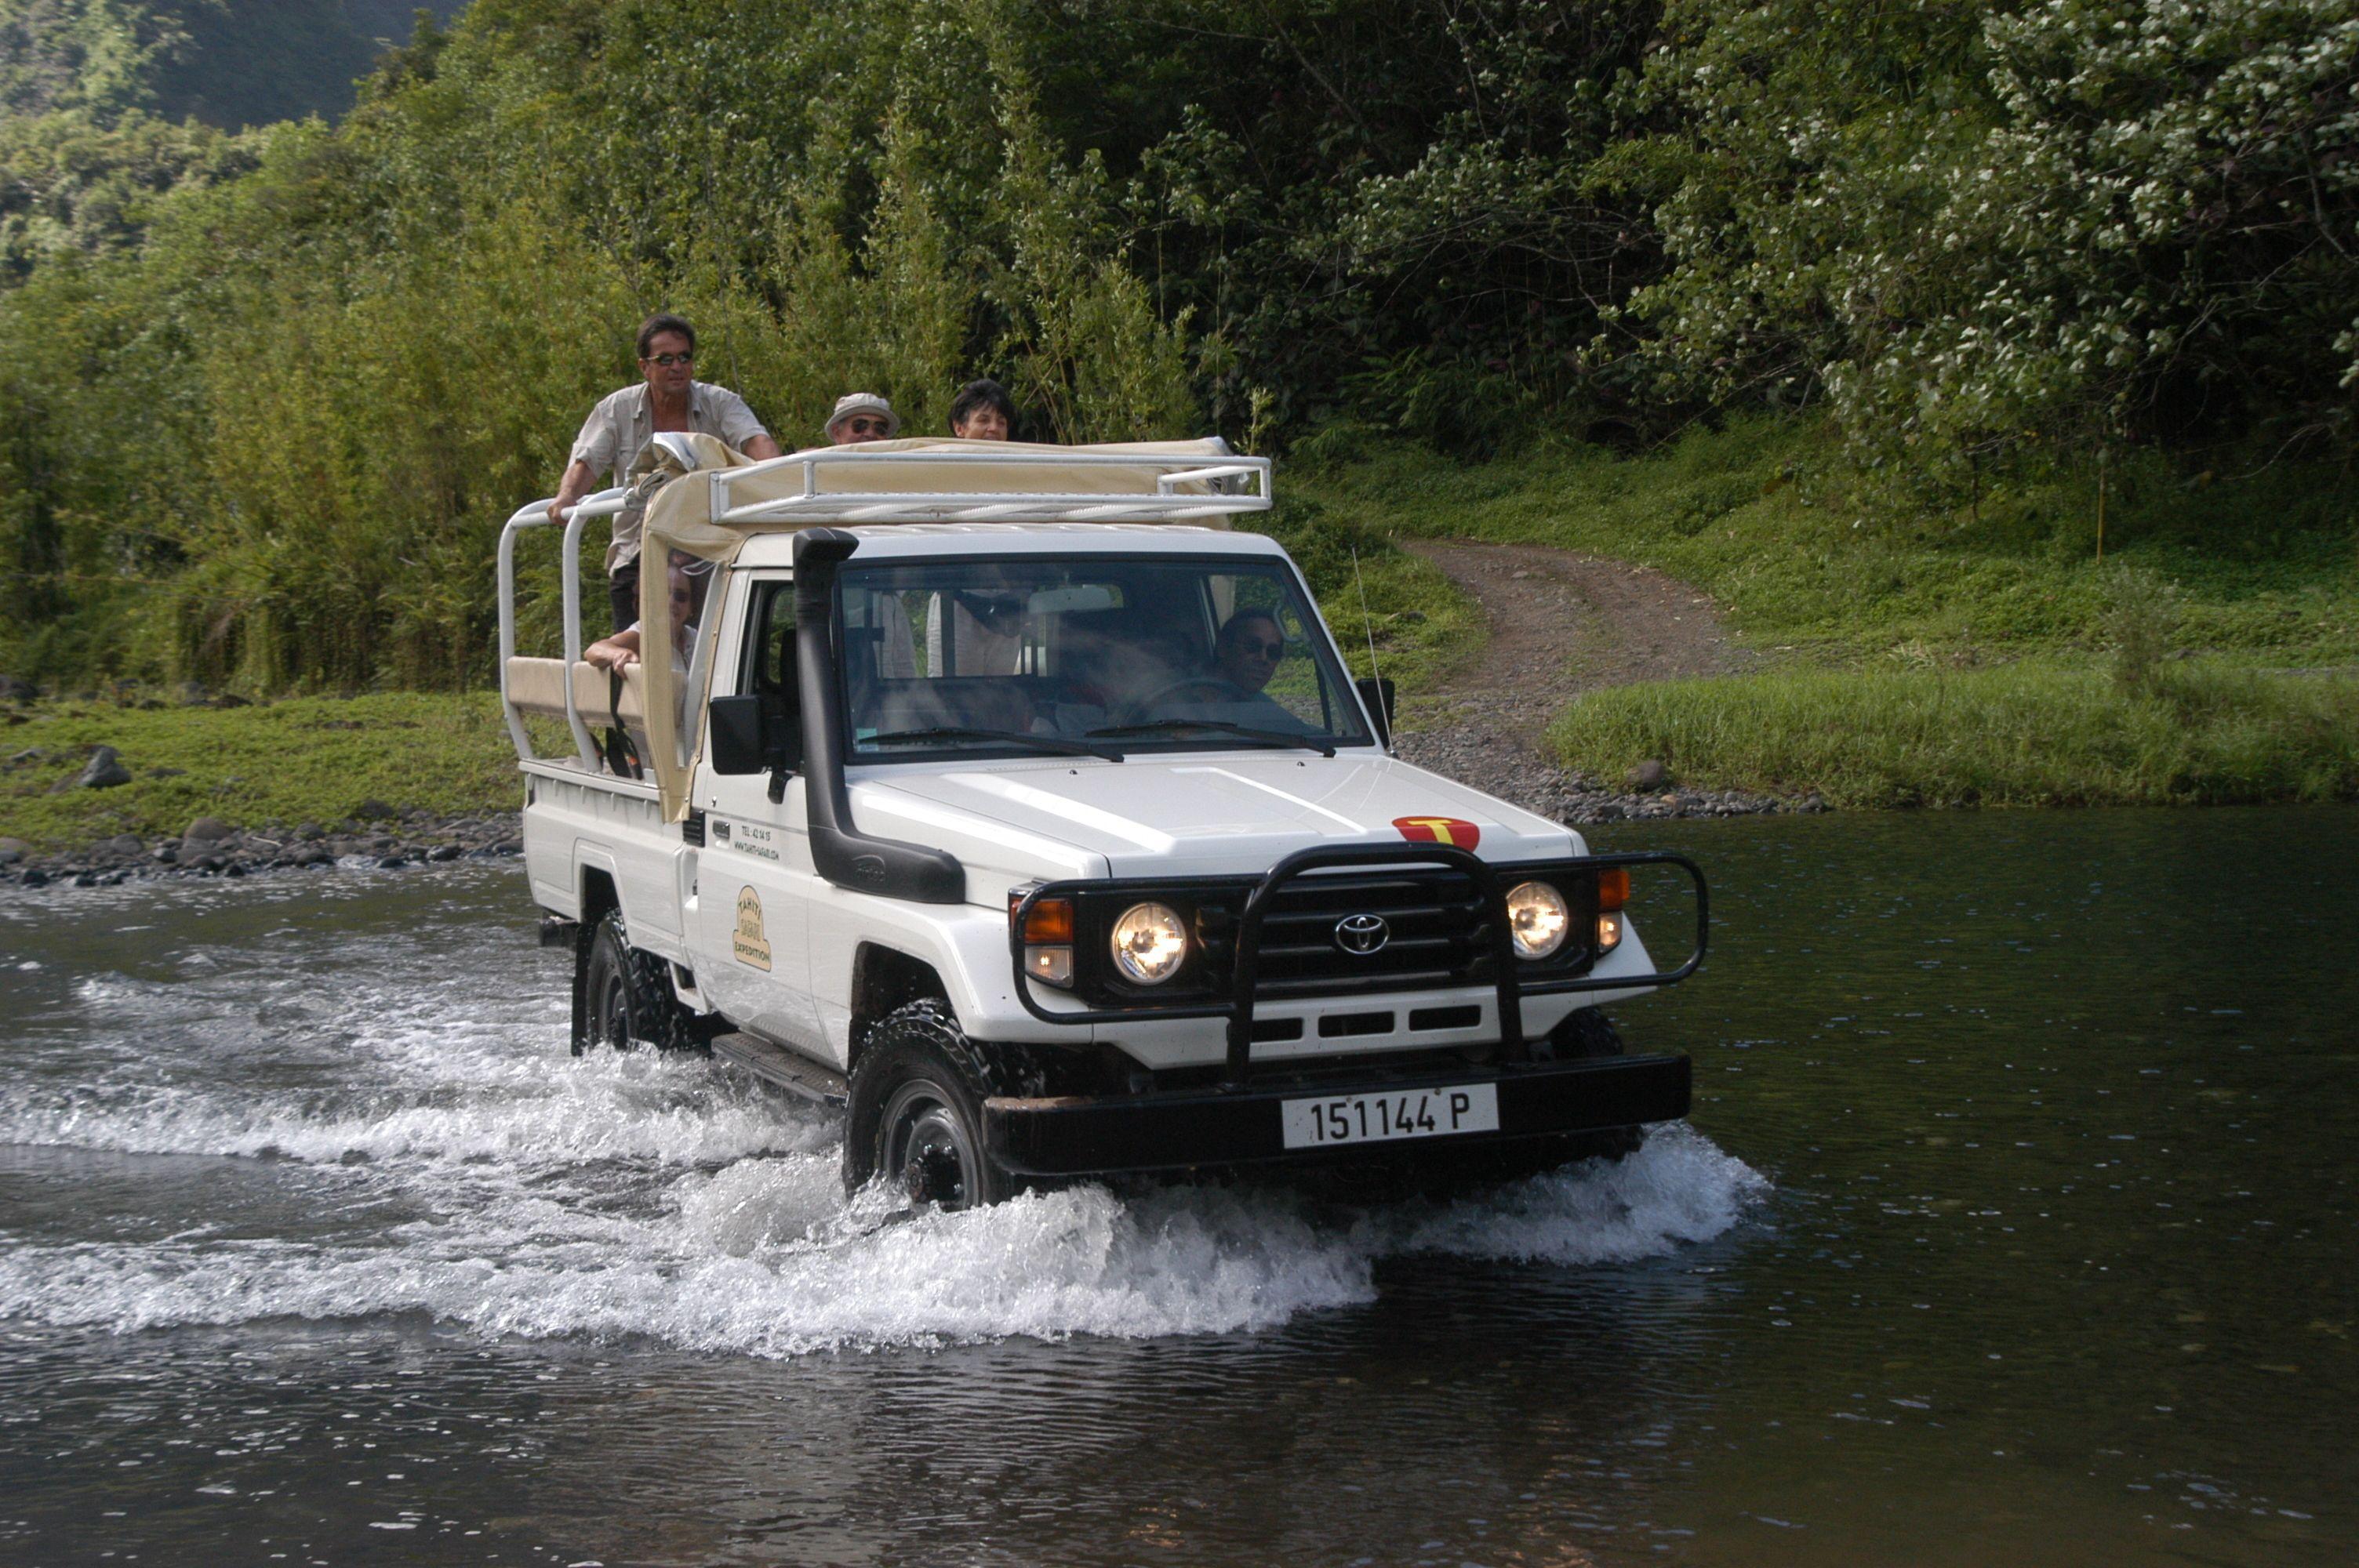 4-Wheel-Drive Mountain Safari Half-Day Tour